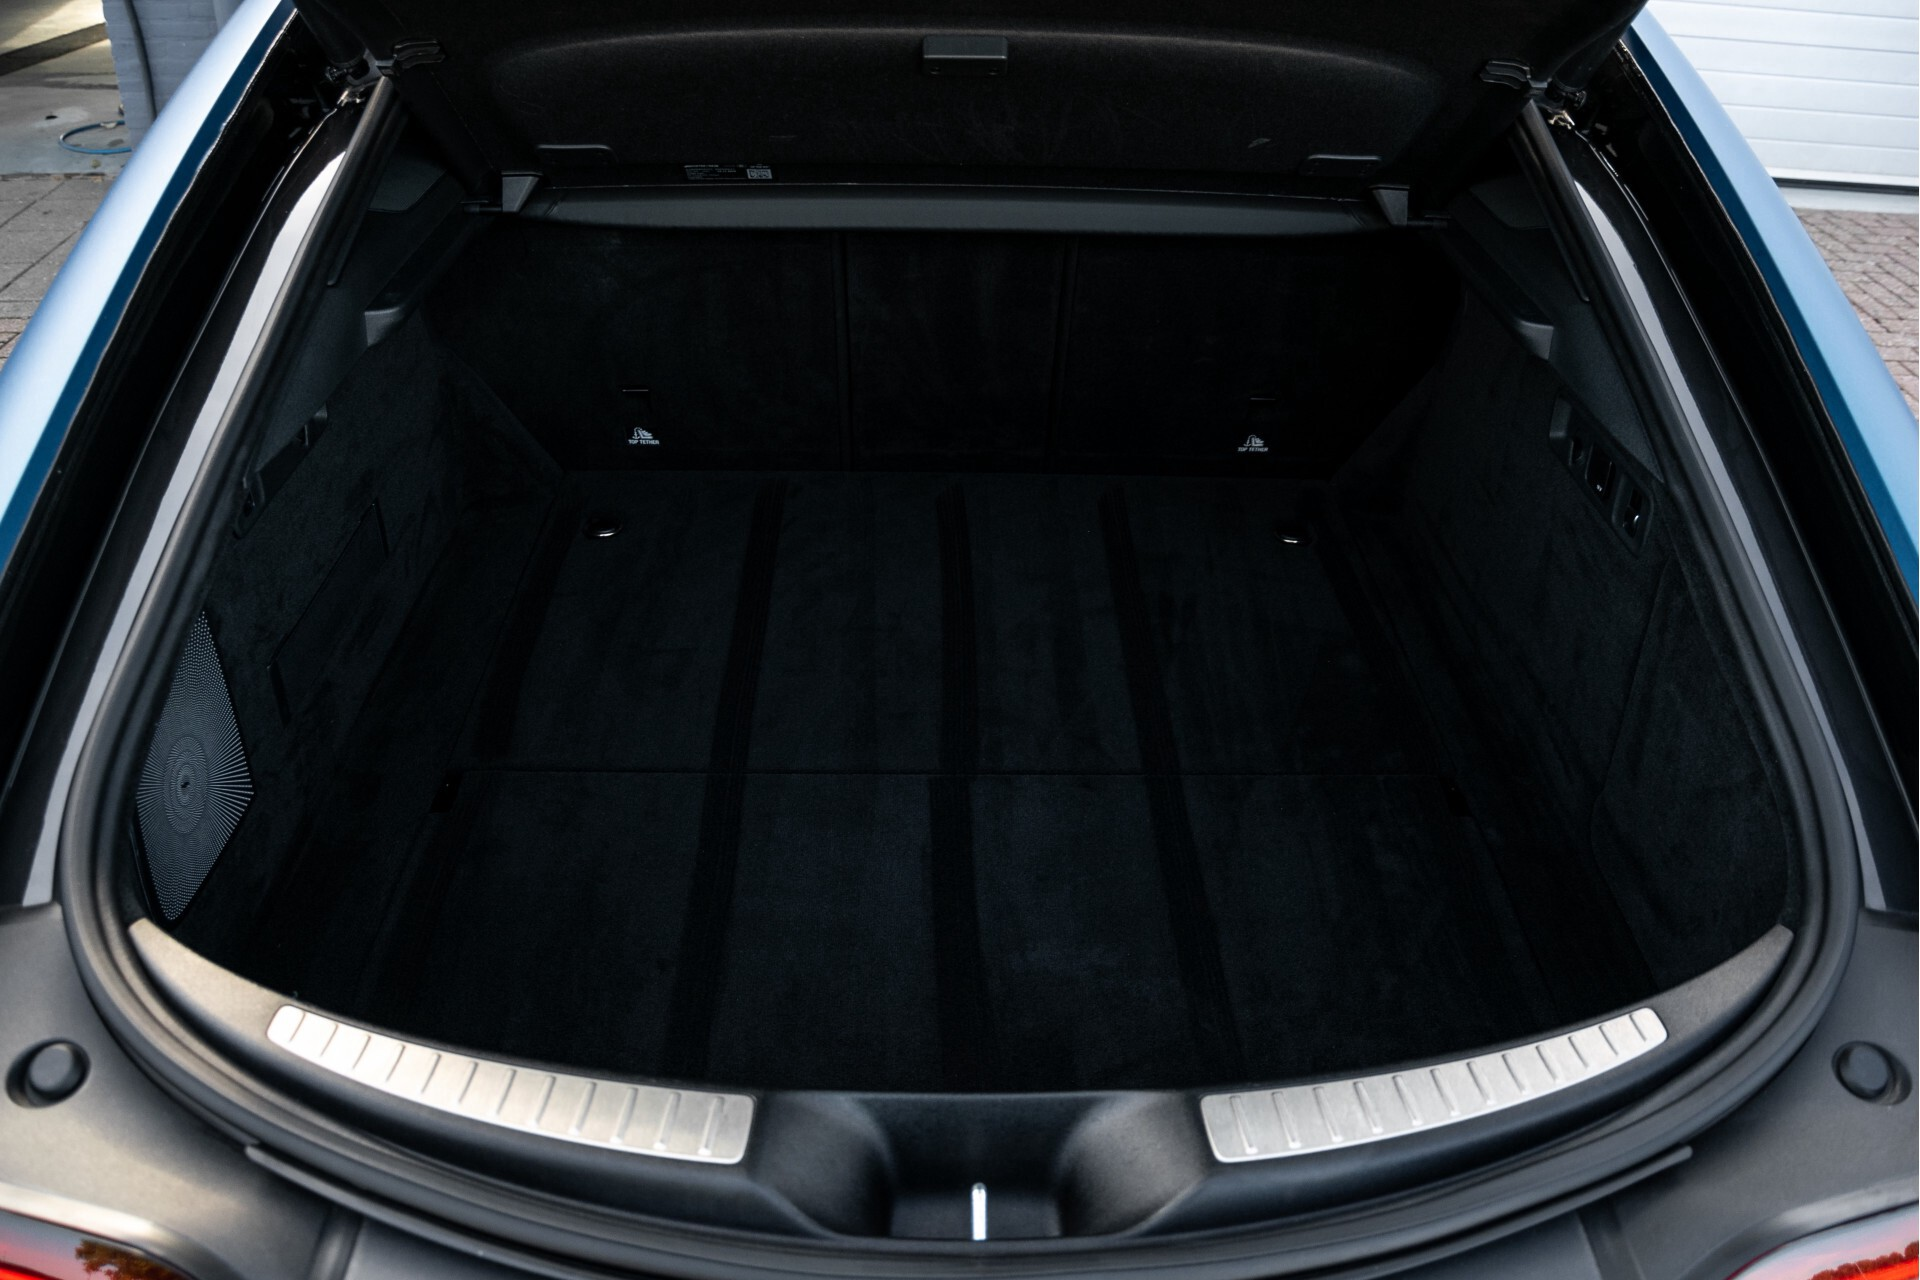 Mercedes-Benz AMG GT 4-Door Coupe 63 S 4MATIC+ Edition 1 Keramisch/Carbon/First Class/Dynamic Plus/Burmester High End 3D Aut9 Foto 79